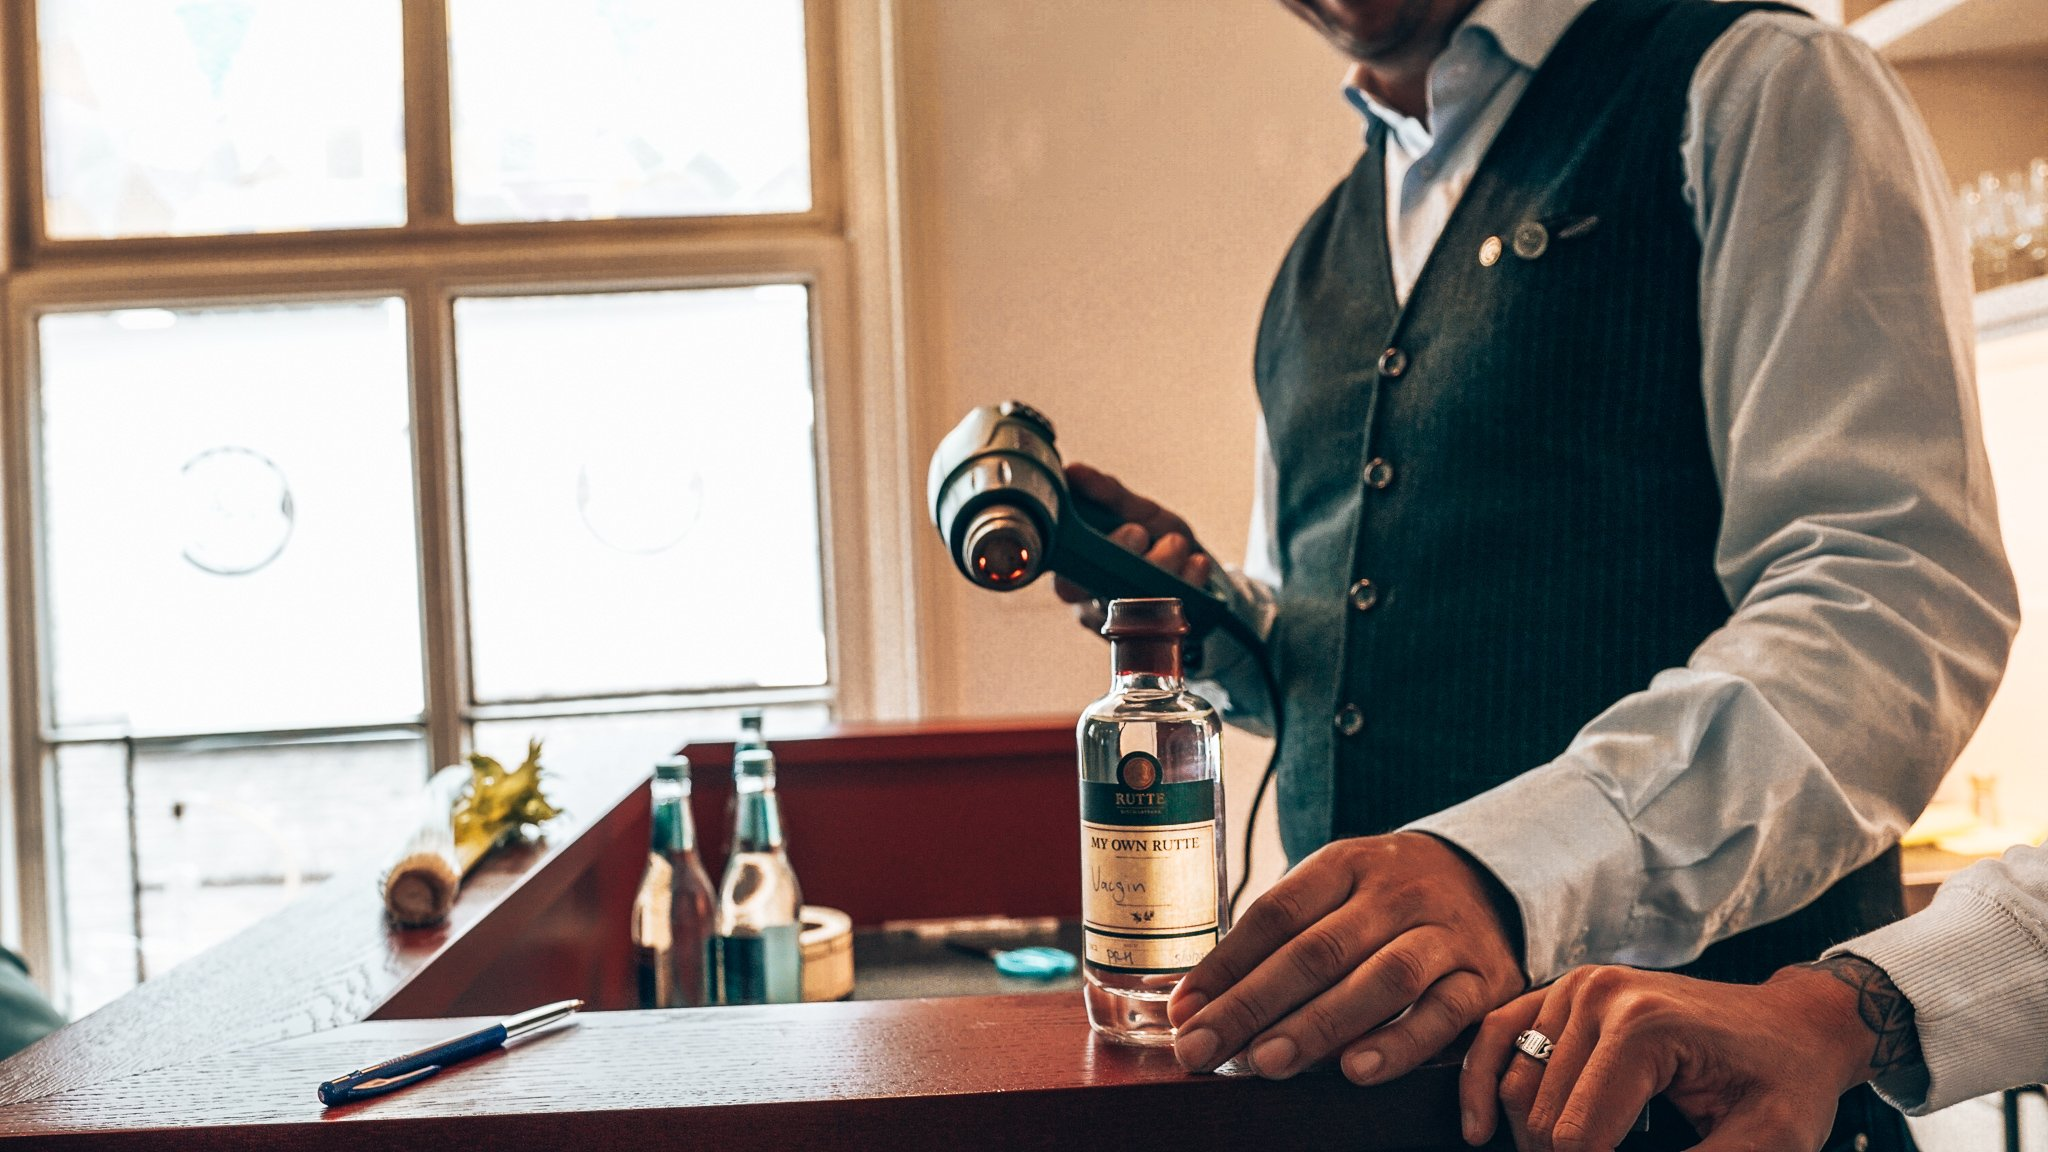 Eigen gin dichtbranden, workshop gin maken, Distilleerderij Rutte, Alles over gin.